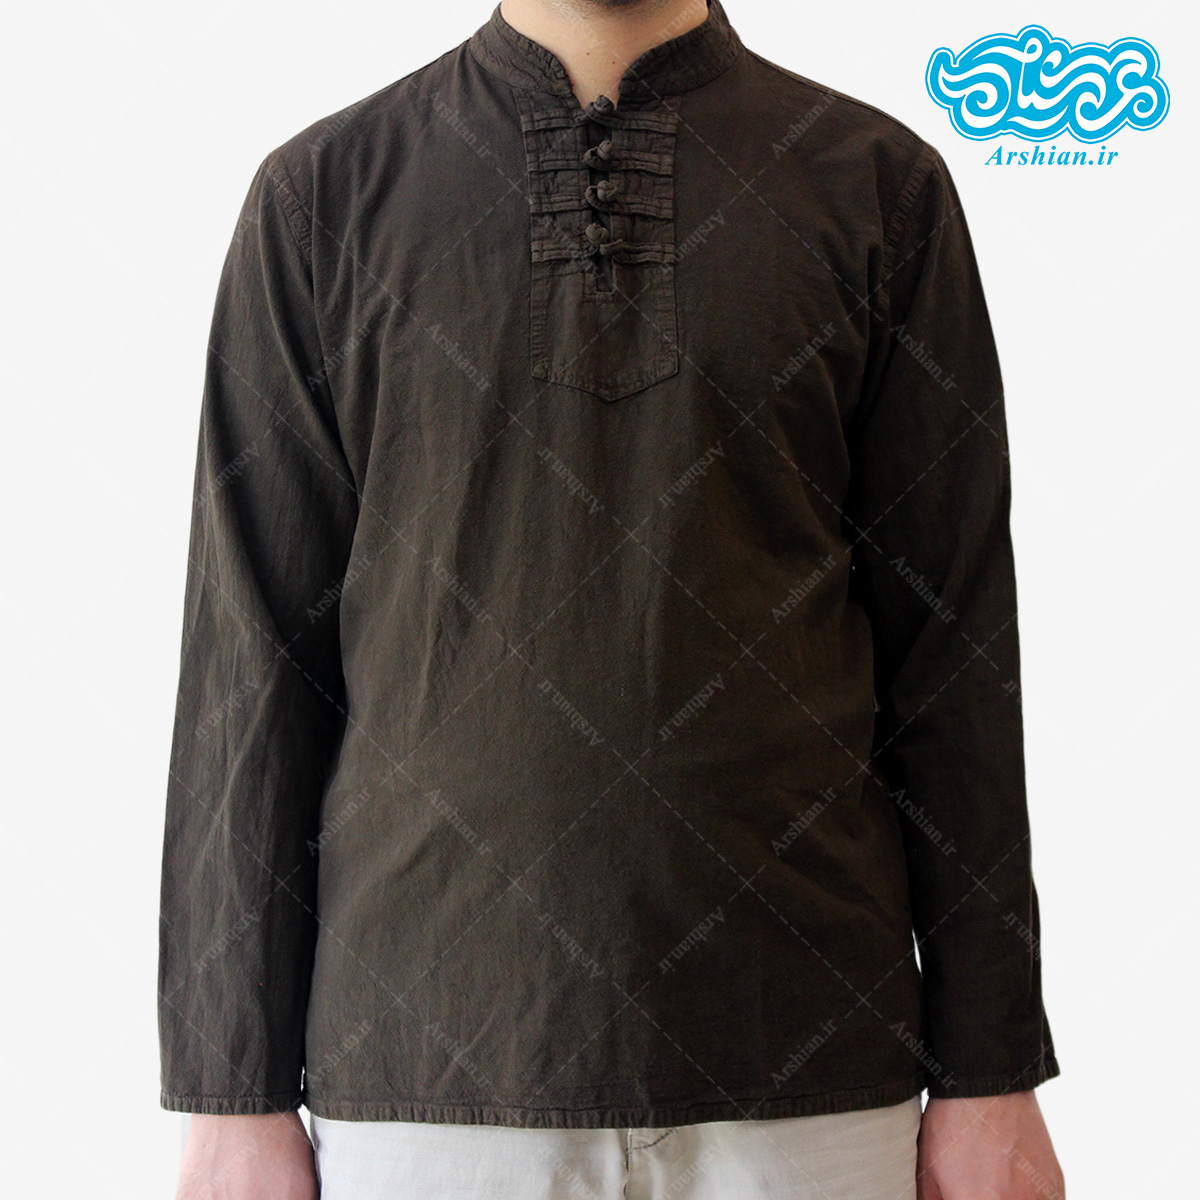 پیراهن الیاف طبیعی طرح گره ای مدل gha001